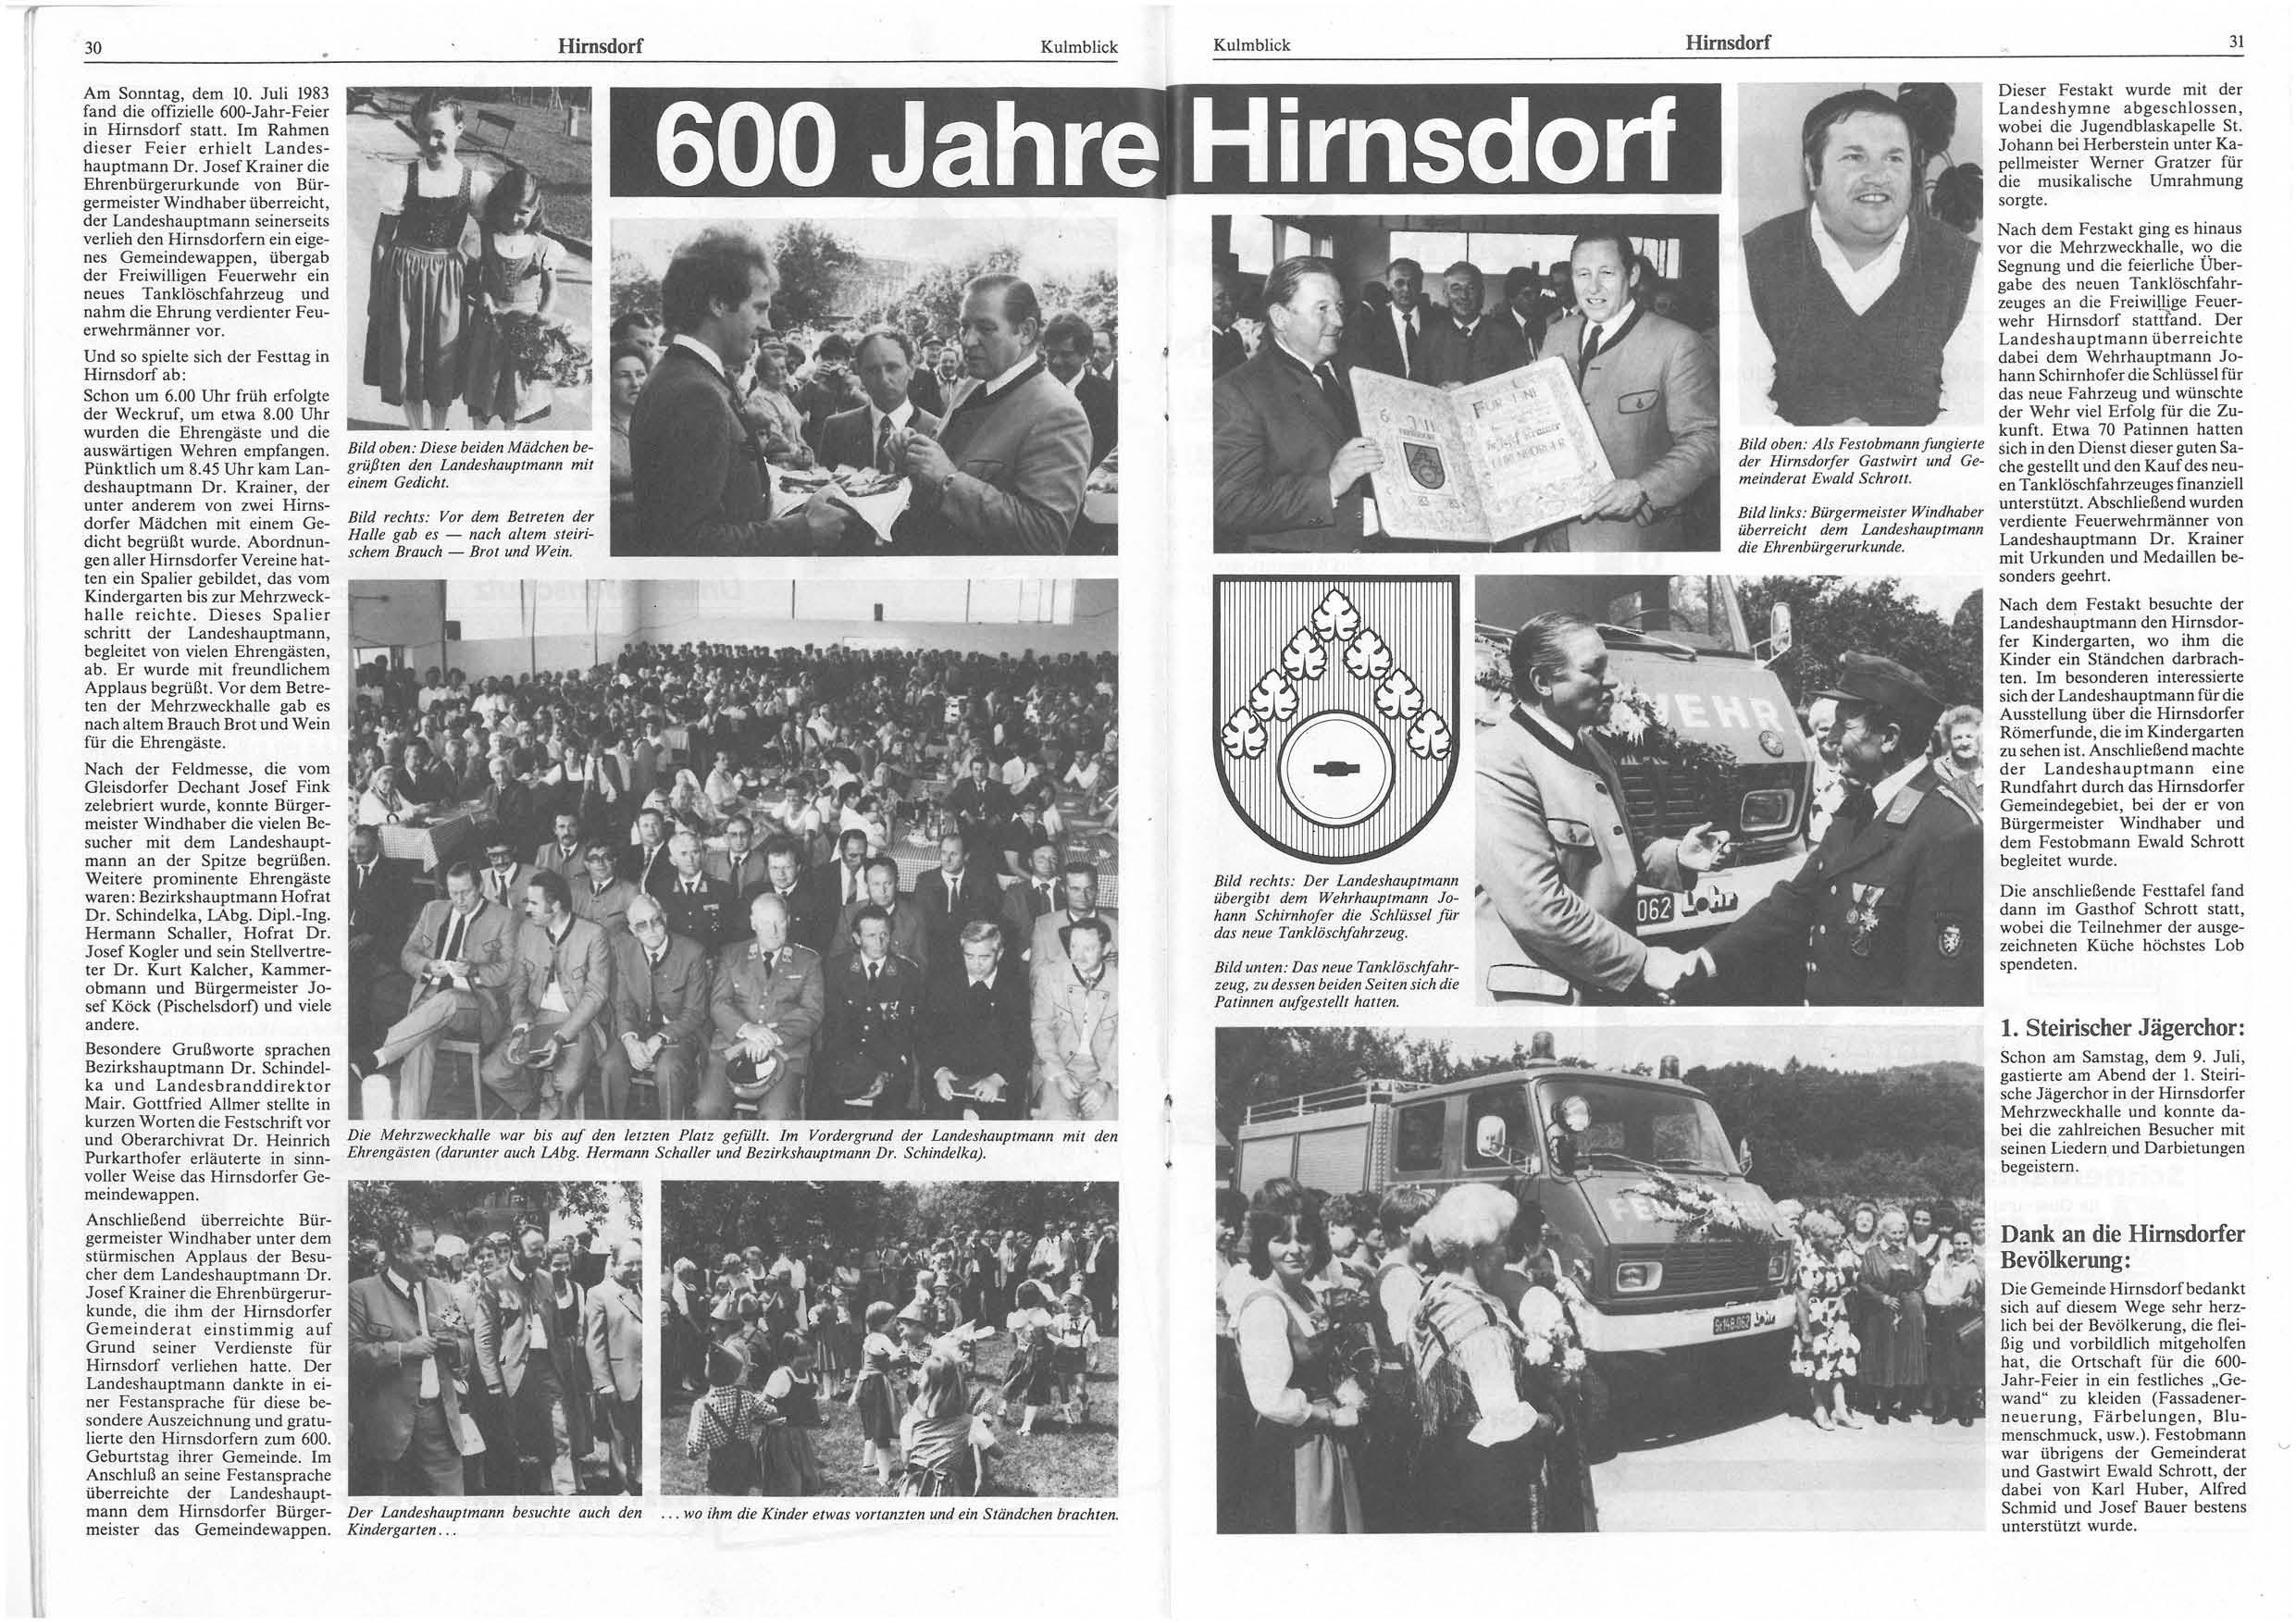 Bericht Kulmblick_3